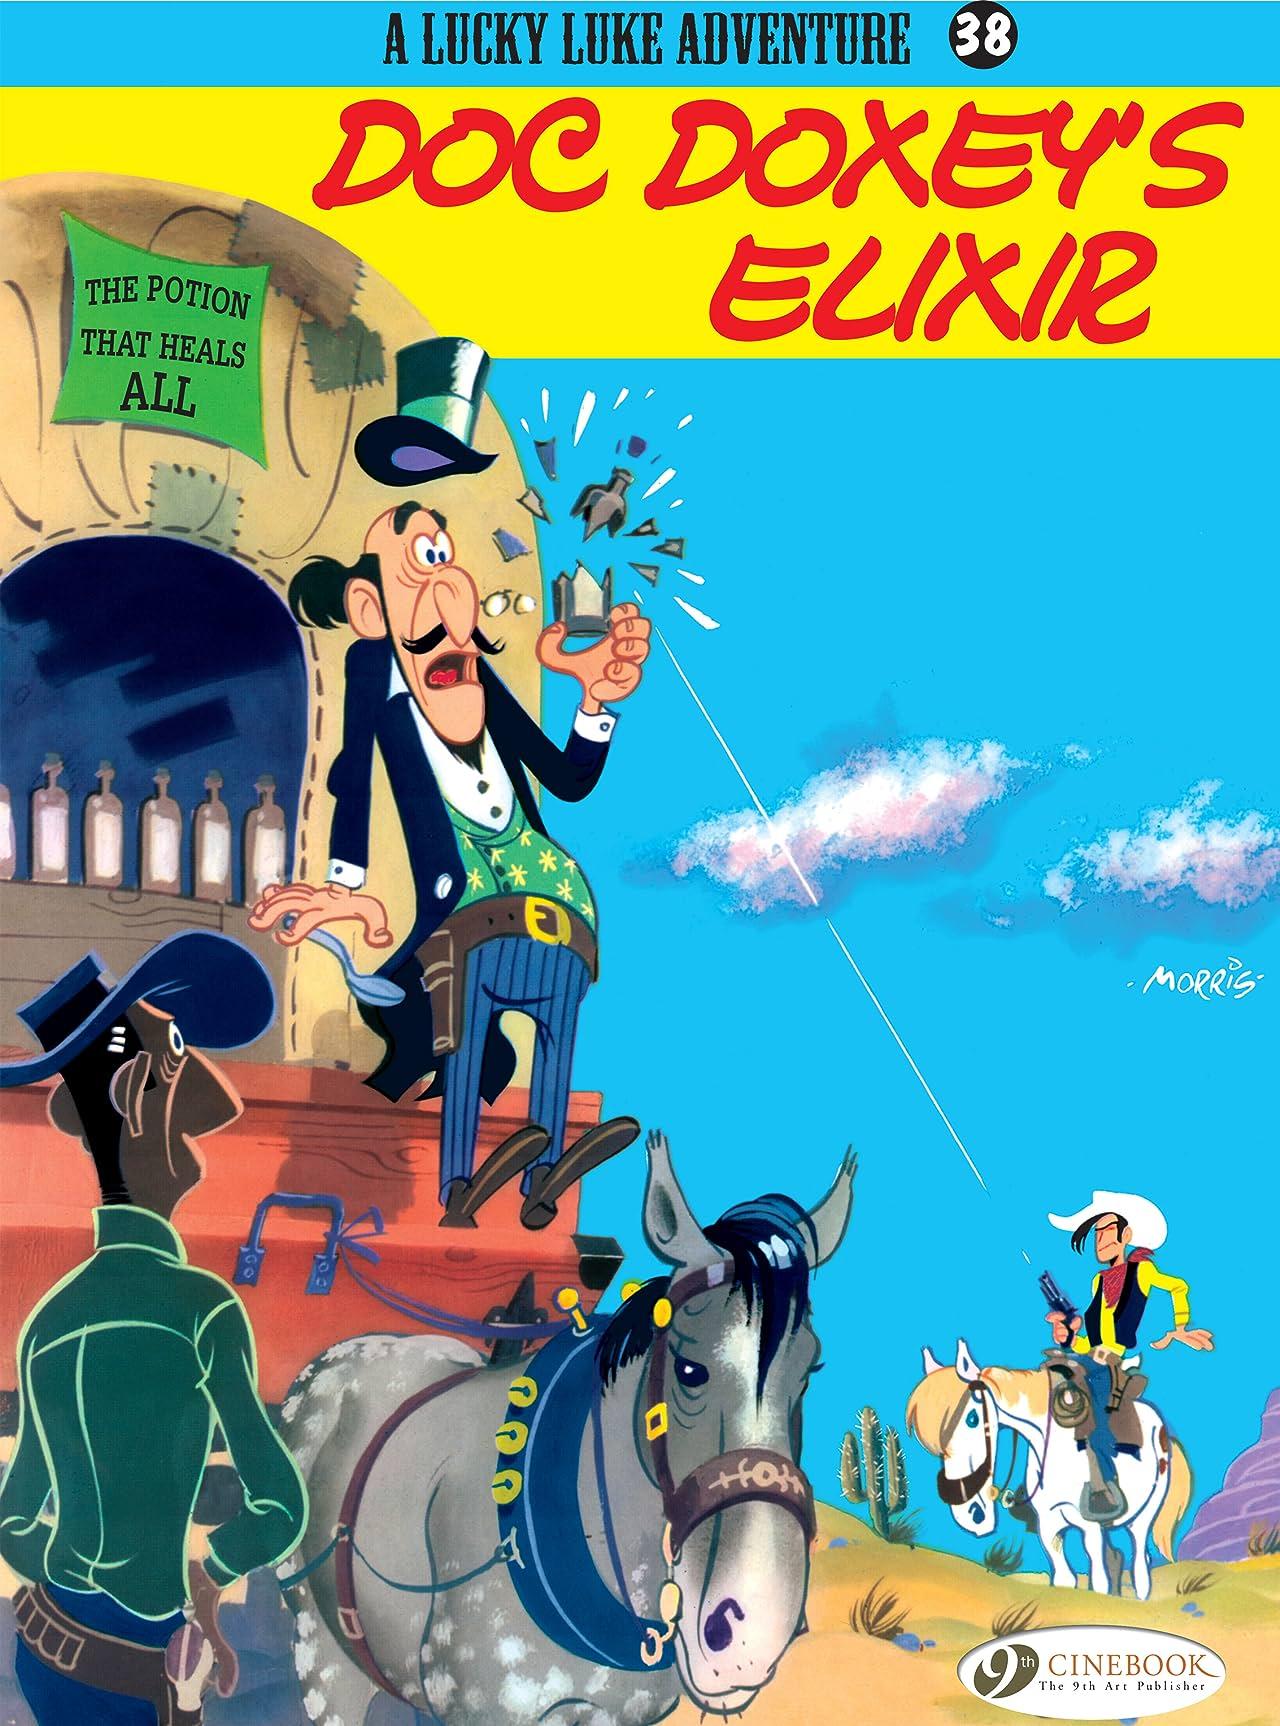 Lucky Luke Vol. 38: Doc doxey's elixir